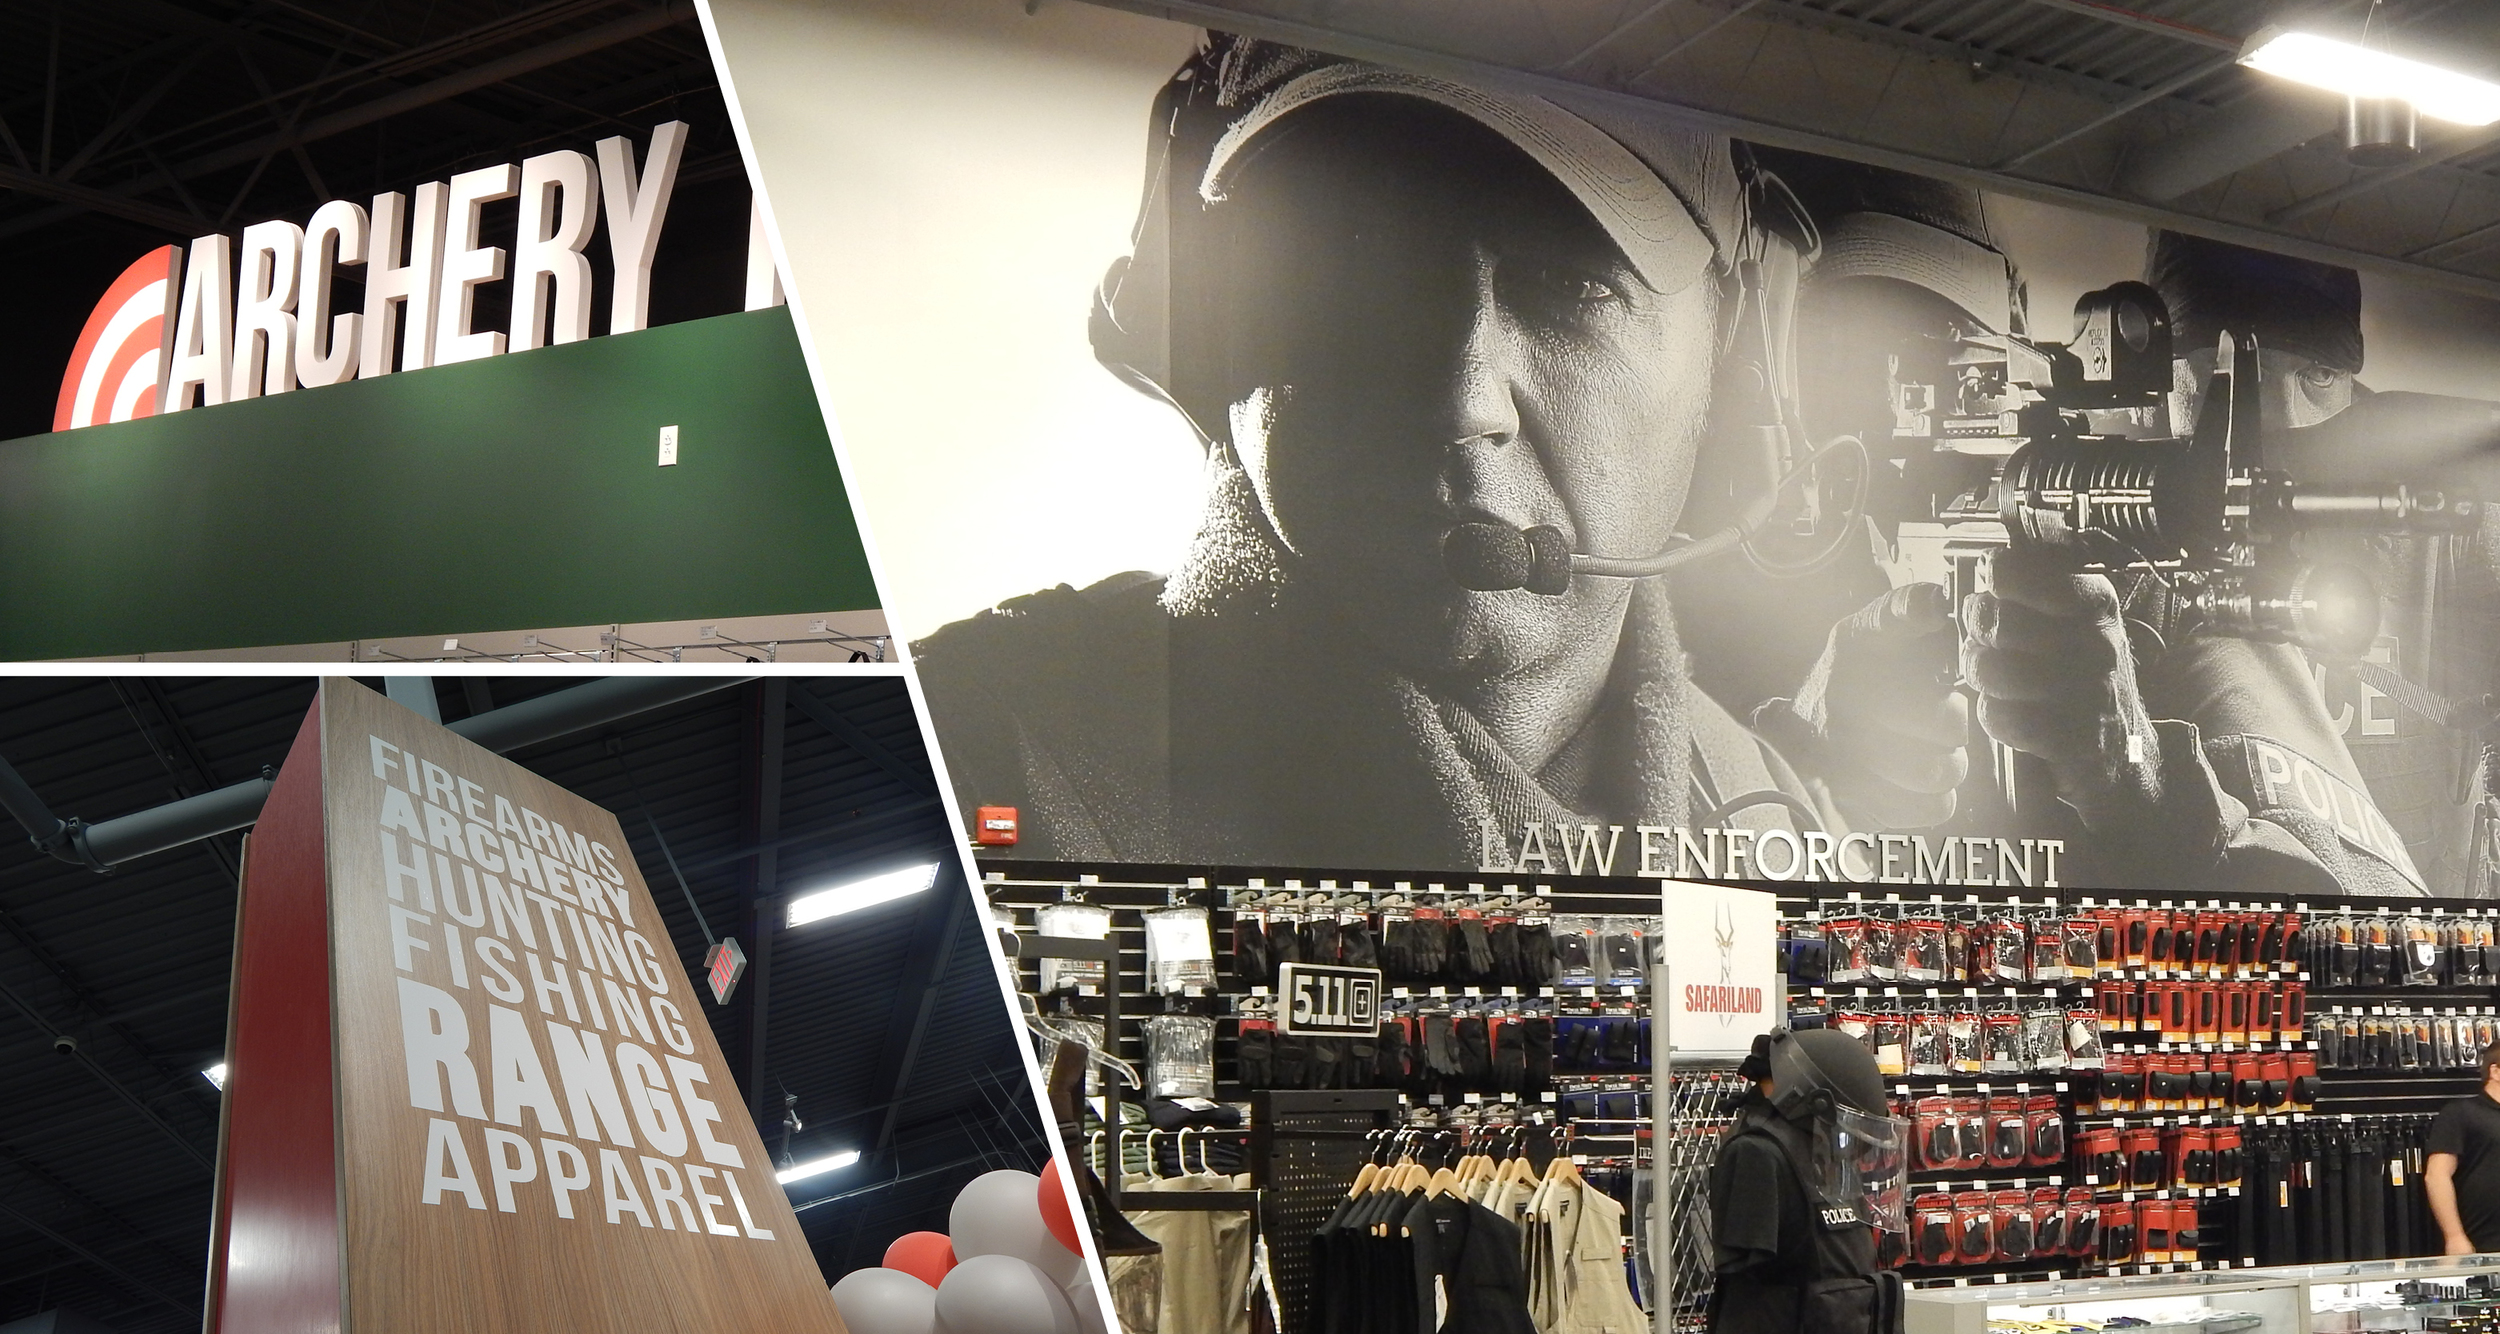 Interior Store Branding  Displays, Wall Coverings